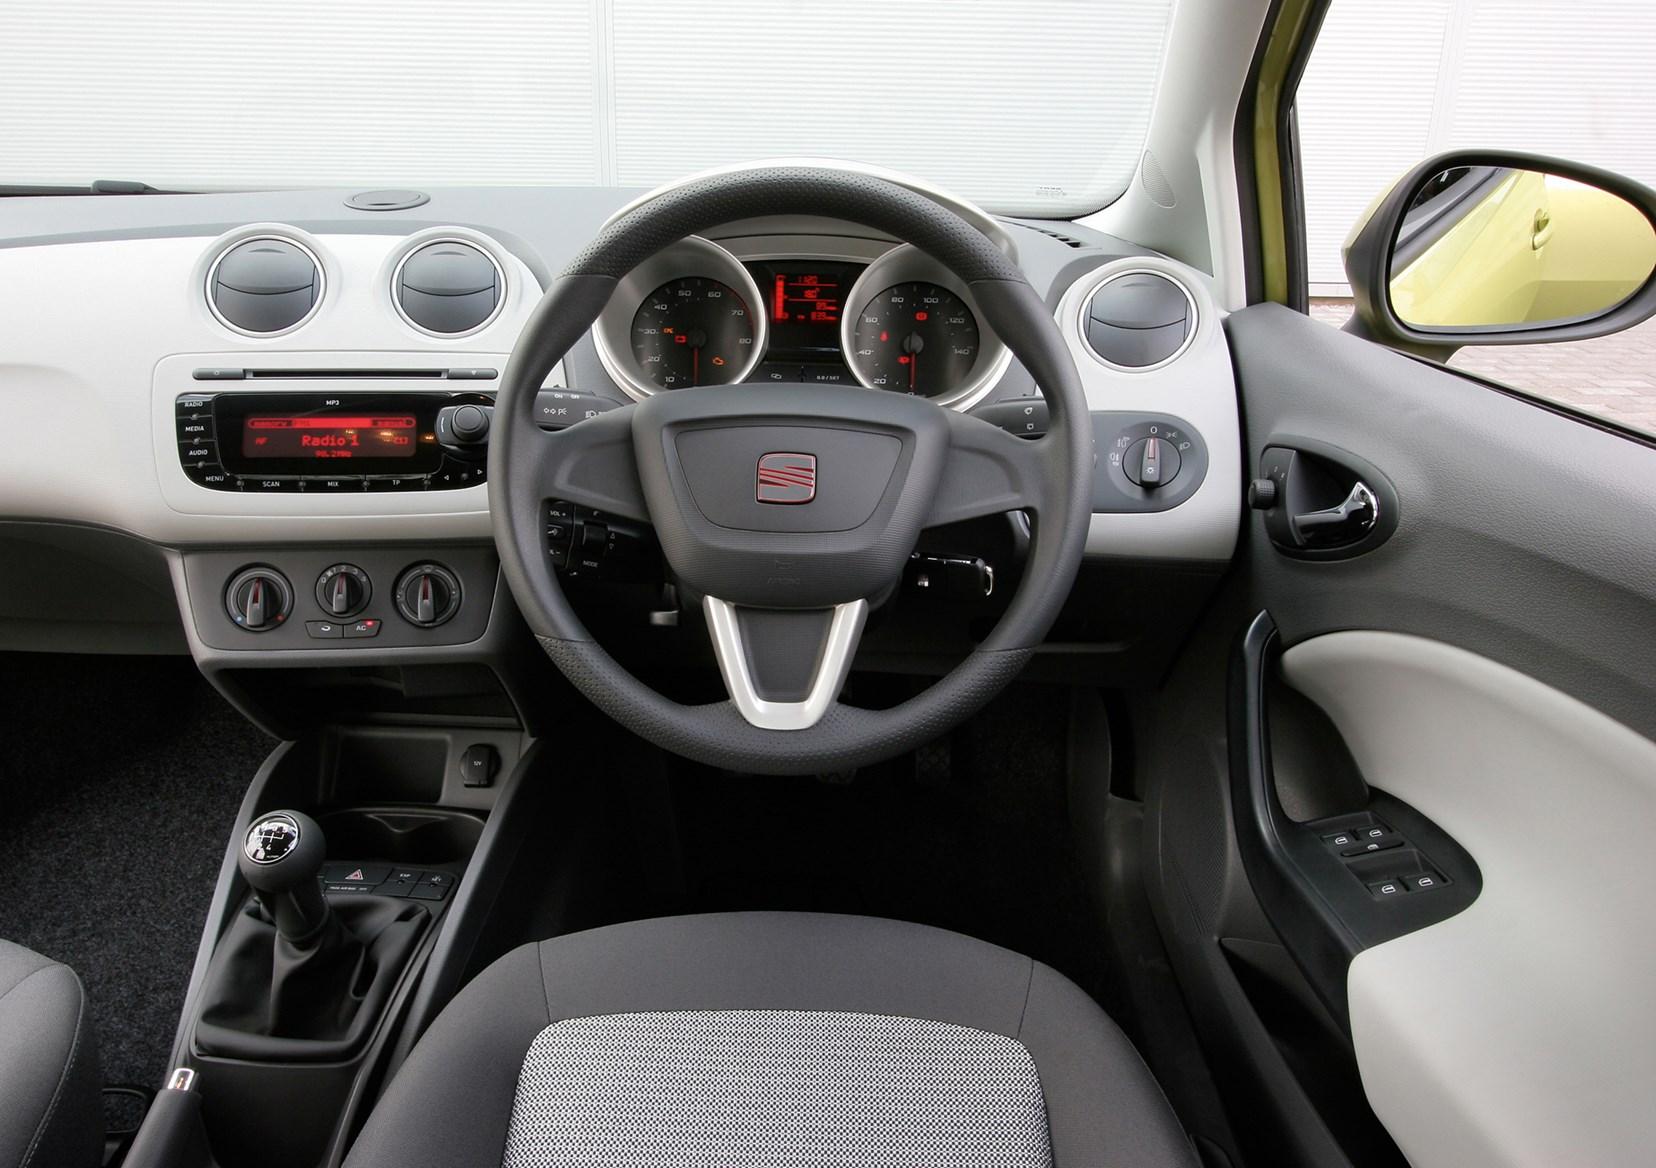 seat ibiza hatchback 2008 driving performance parkers. Black Bedroom Furniture Sets. Home Design Ideas